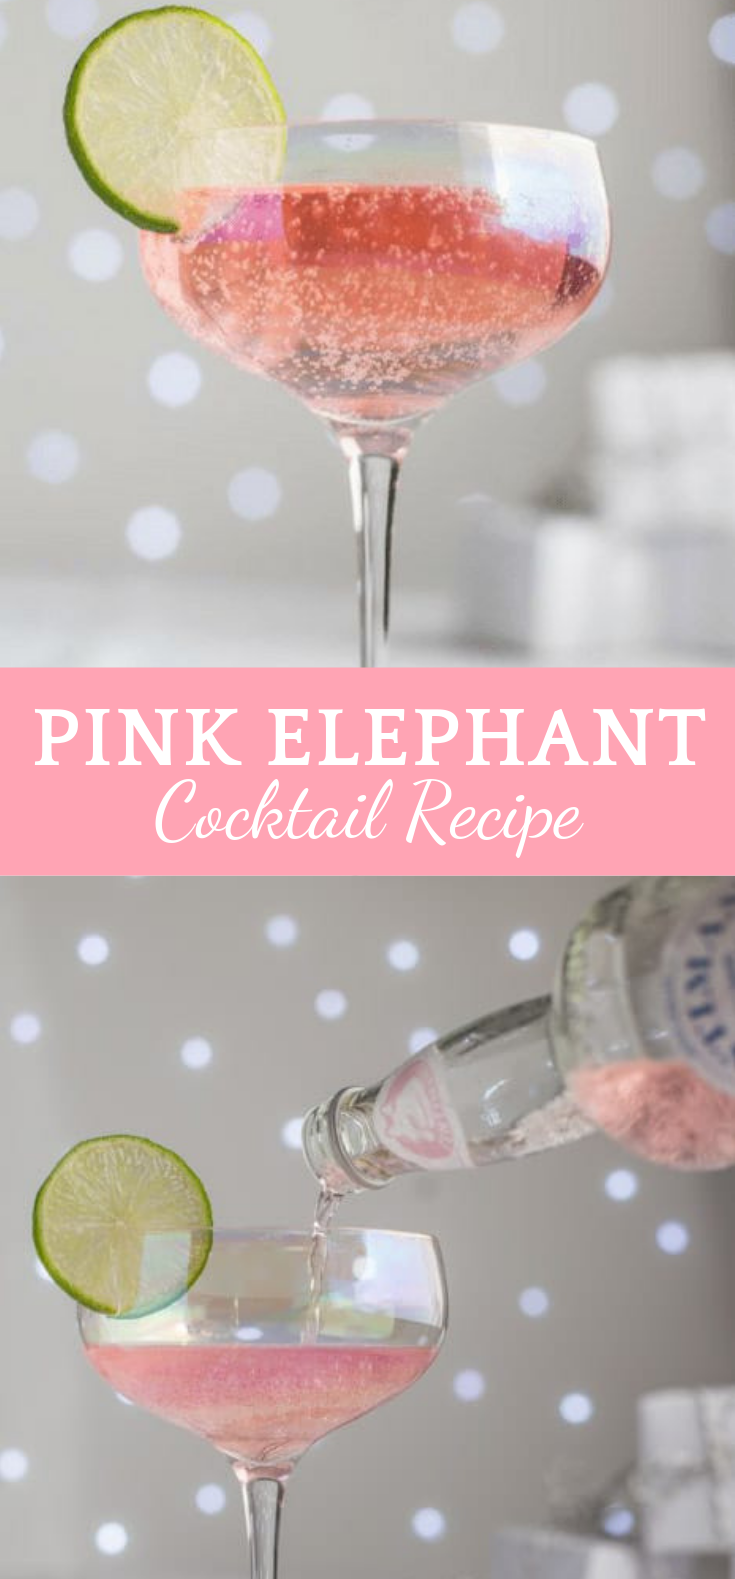 PINK ELEPHANT COCKTAIL RECIPE #Cocktail #Drink #cocktaildrinks